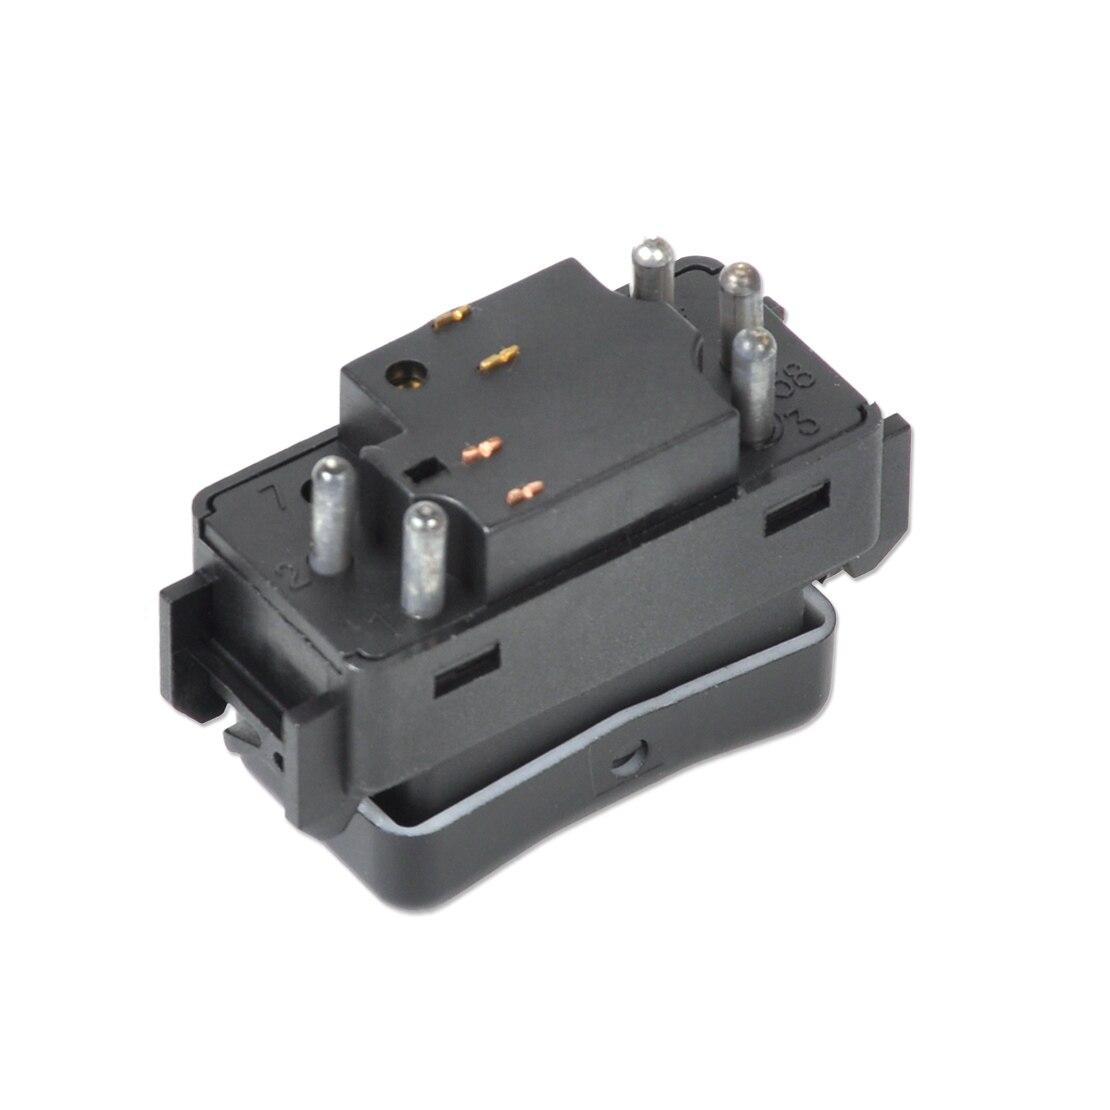 Dwcx 1248204510 1248204610 Left Right Electric Master Control 1993 Mercedesbenz 300ce Engine Wiring Harness W01331715518 Genuine Power Window Switch For Mercedes Benz W124 W126 W201 S124 W463 In Lever